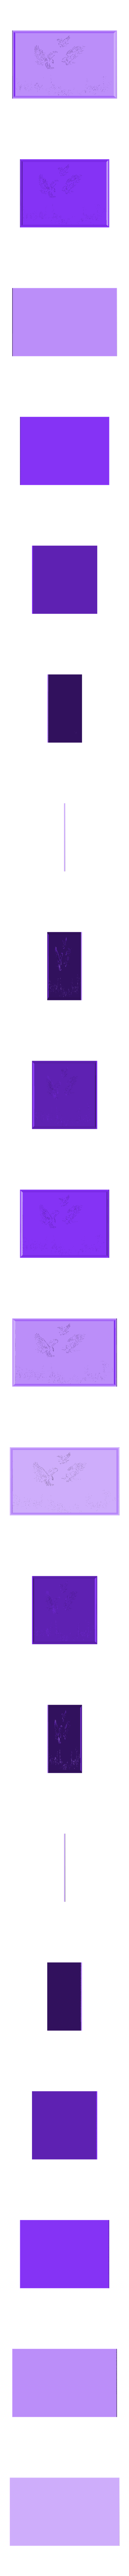 Eagles.stl Download free STL file Eagles • 3D printable template, yb__magiic